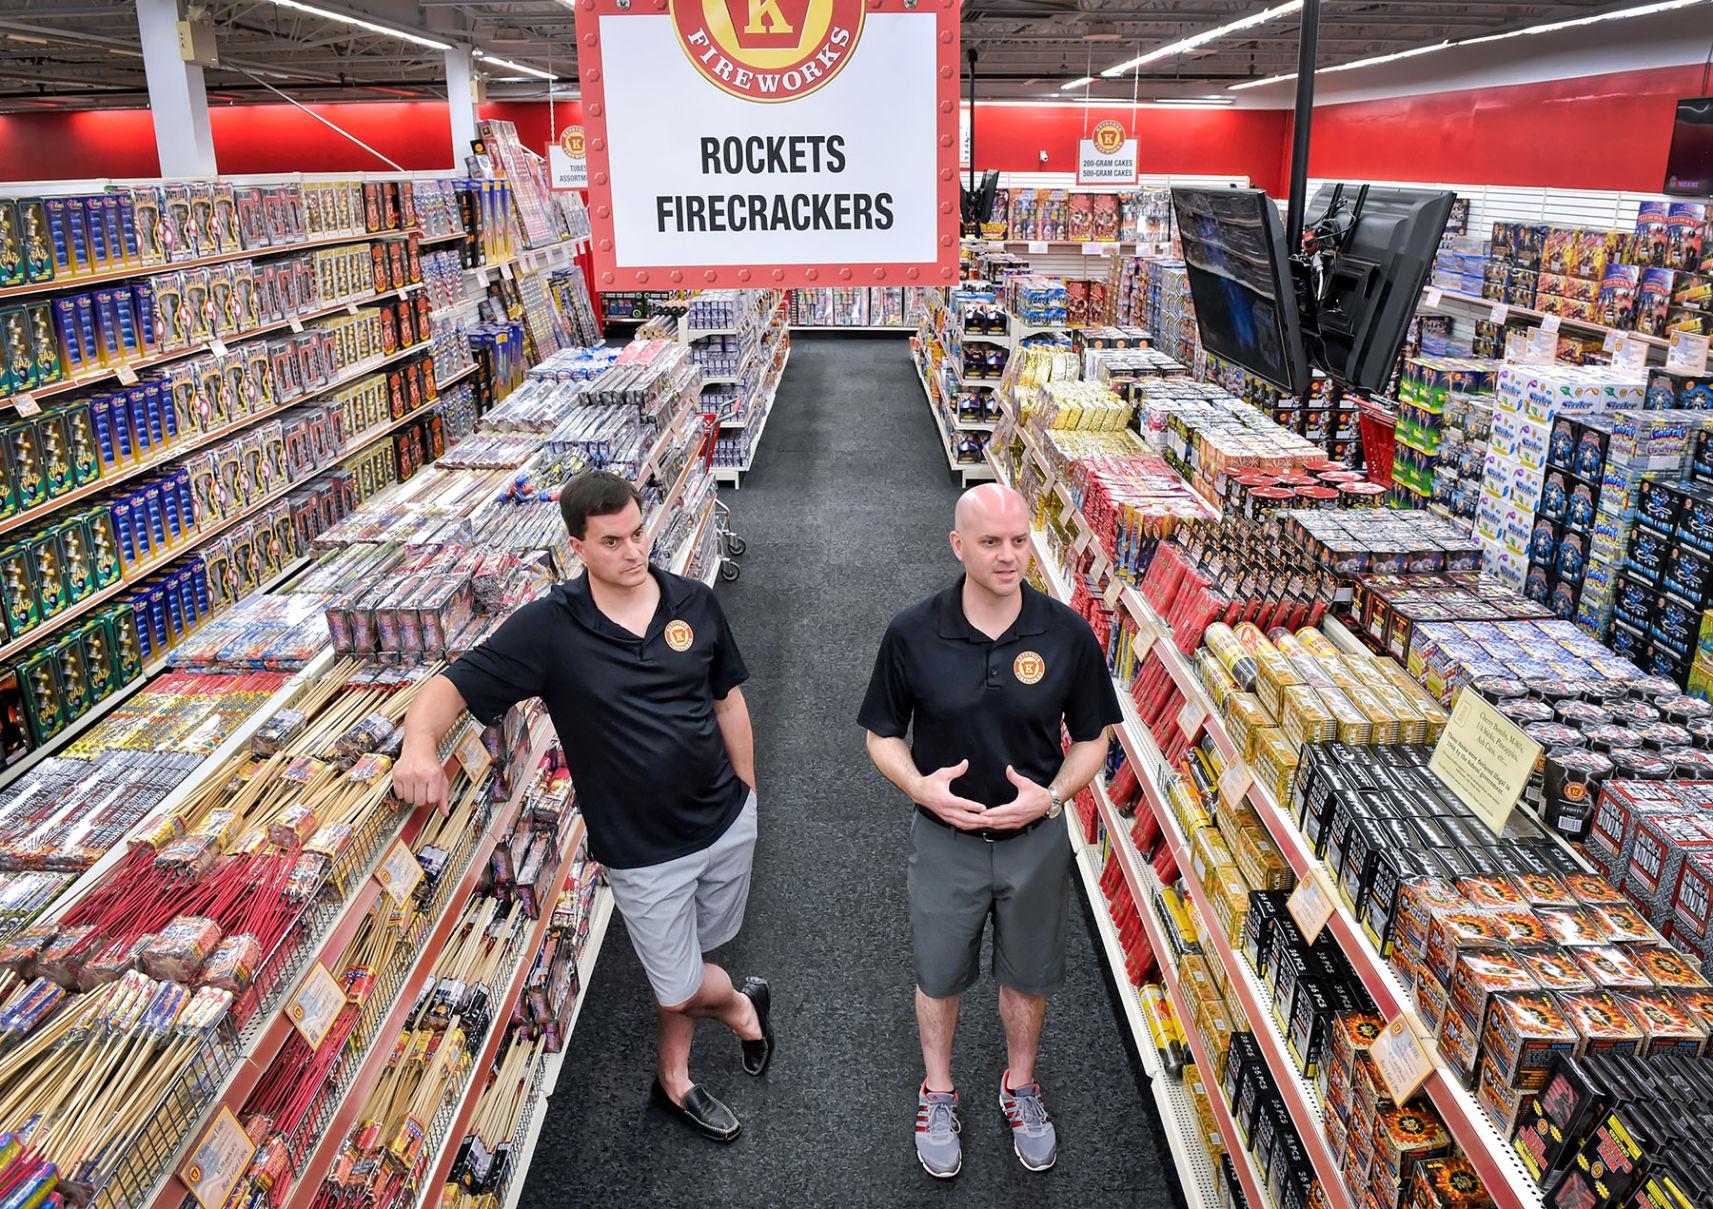 Lancaster pa sex novelty stores